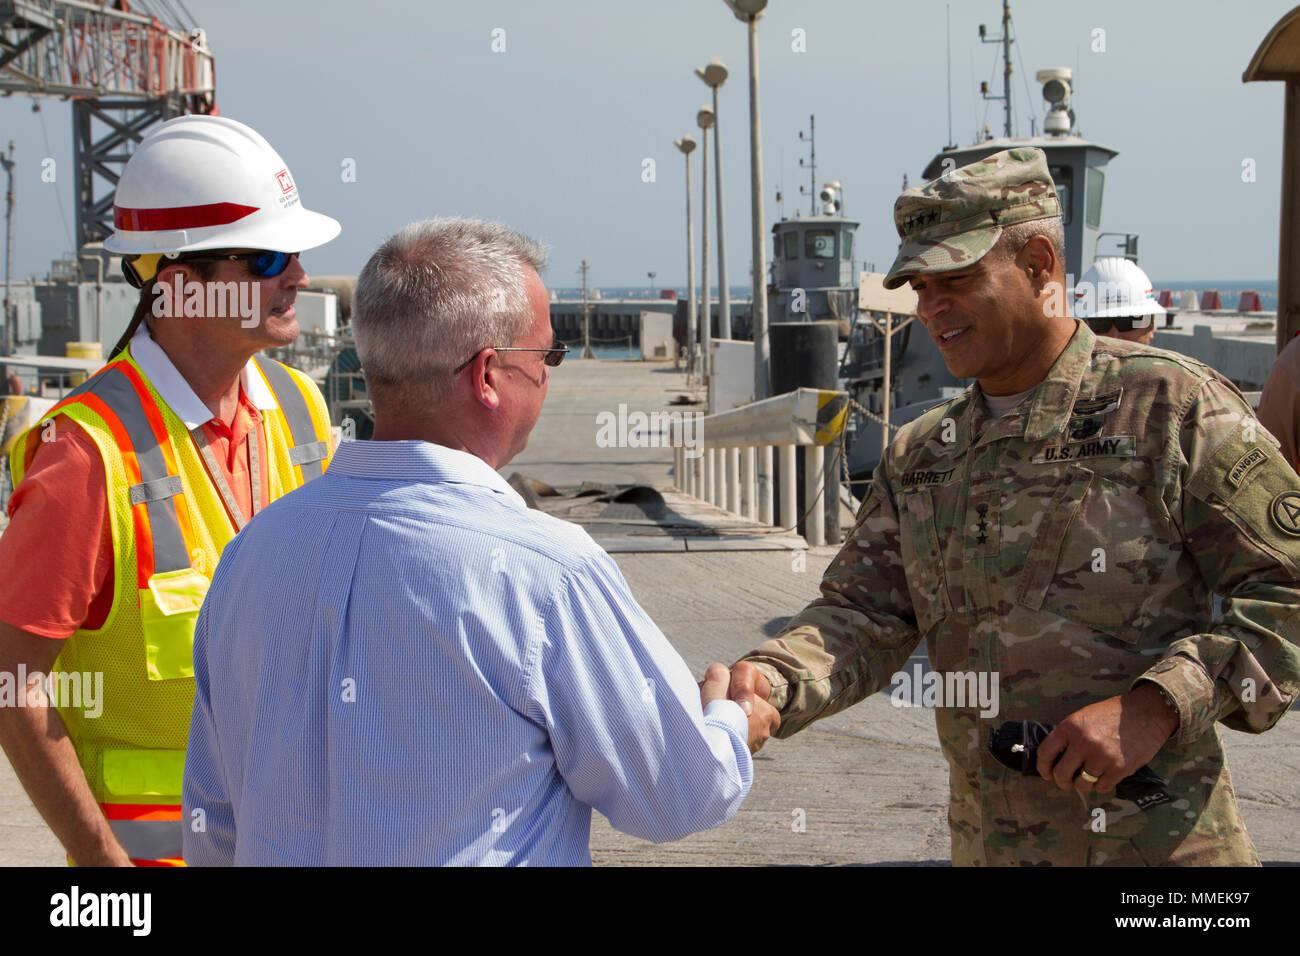 Kuwait Army Base Jobs